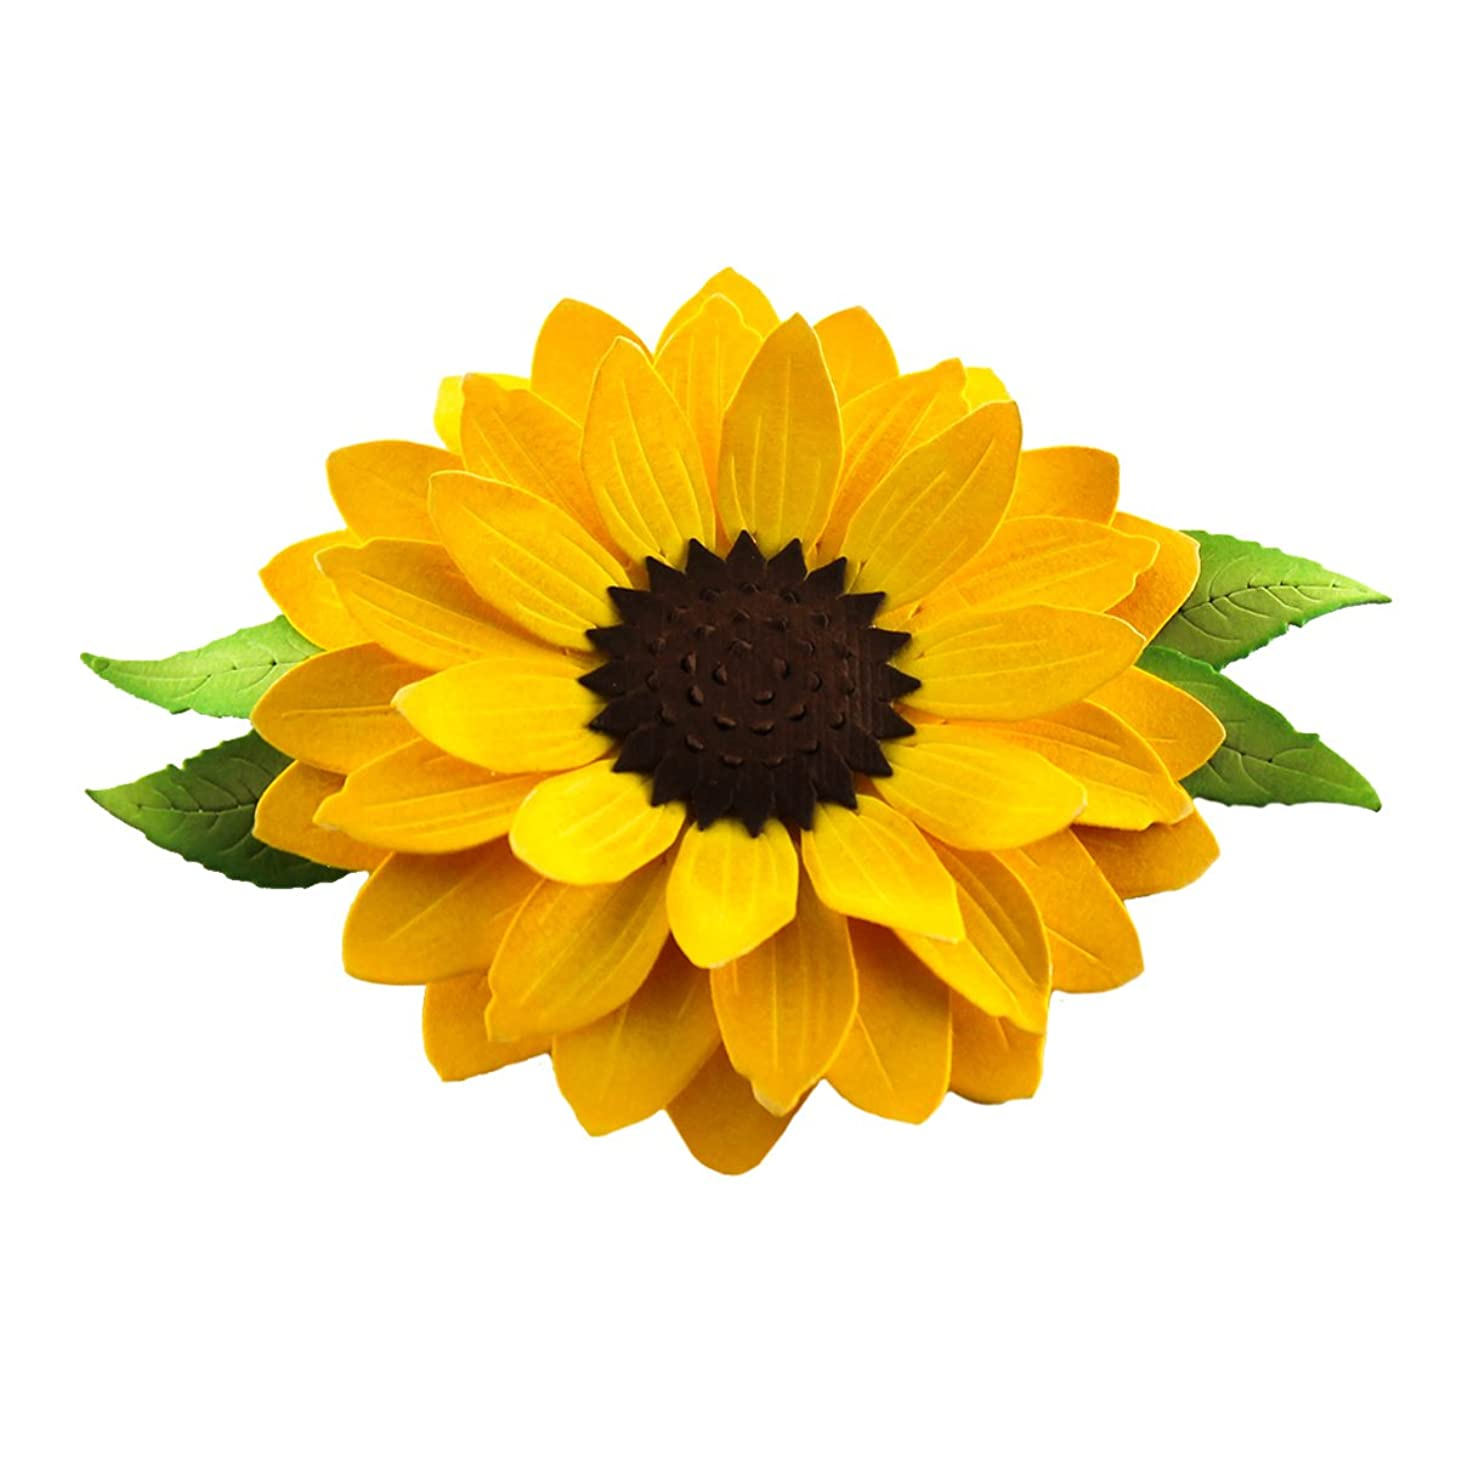 Spellbinders S2-061 Shapeabilities 'Create a Sunflower' Scrapbooking Template